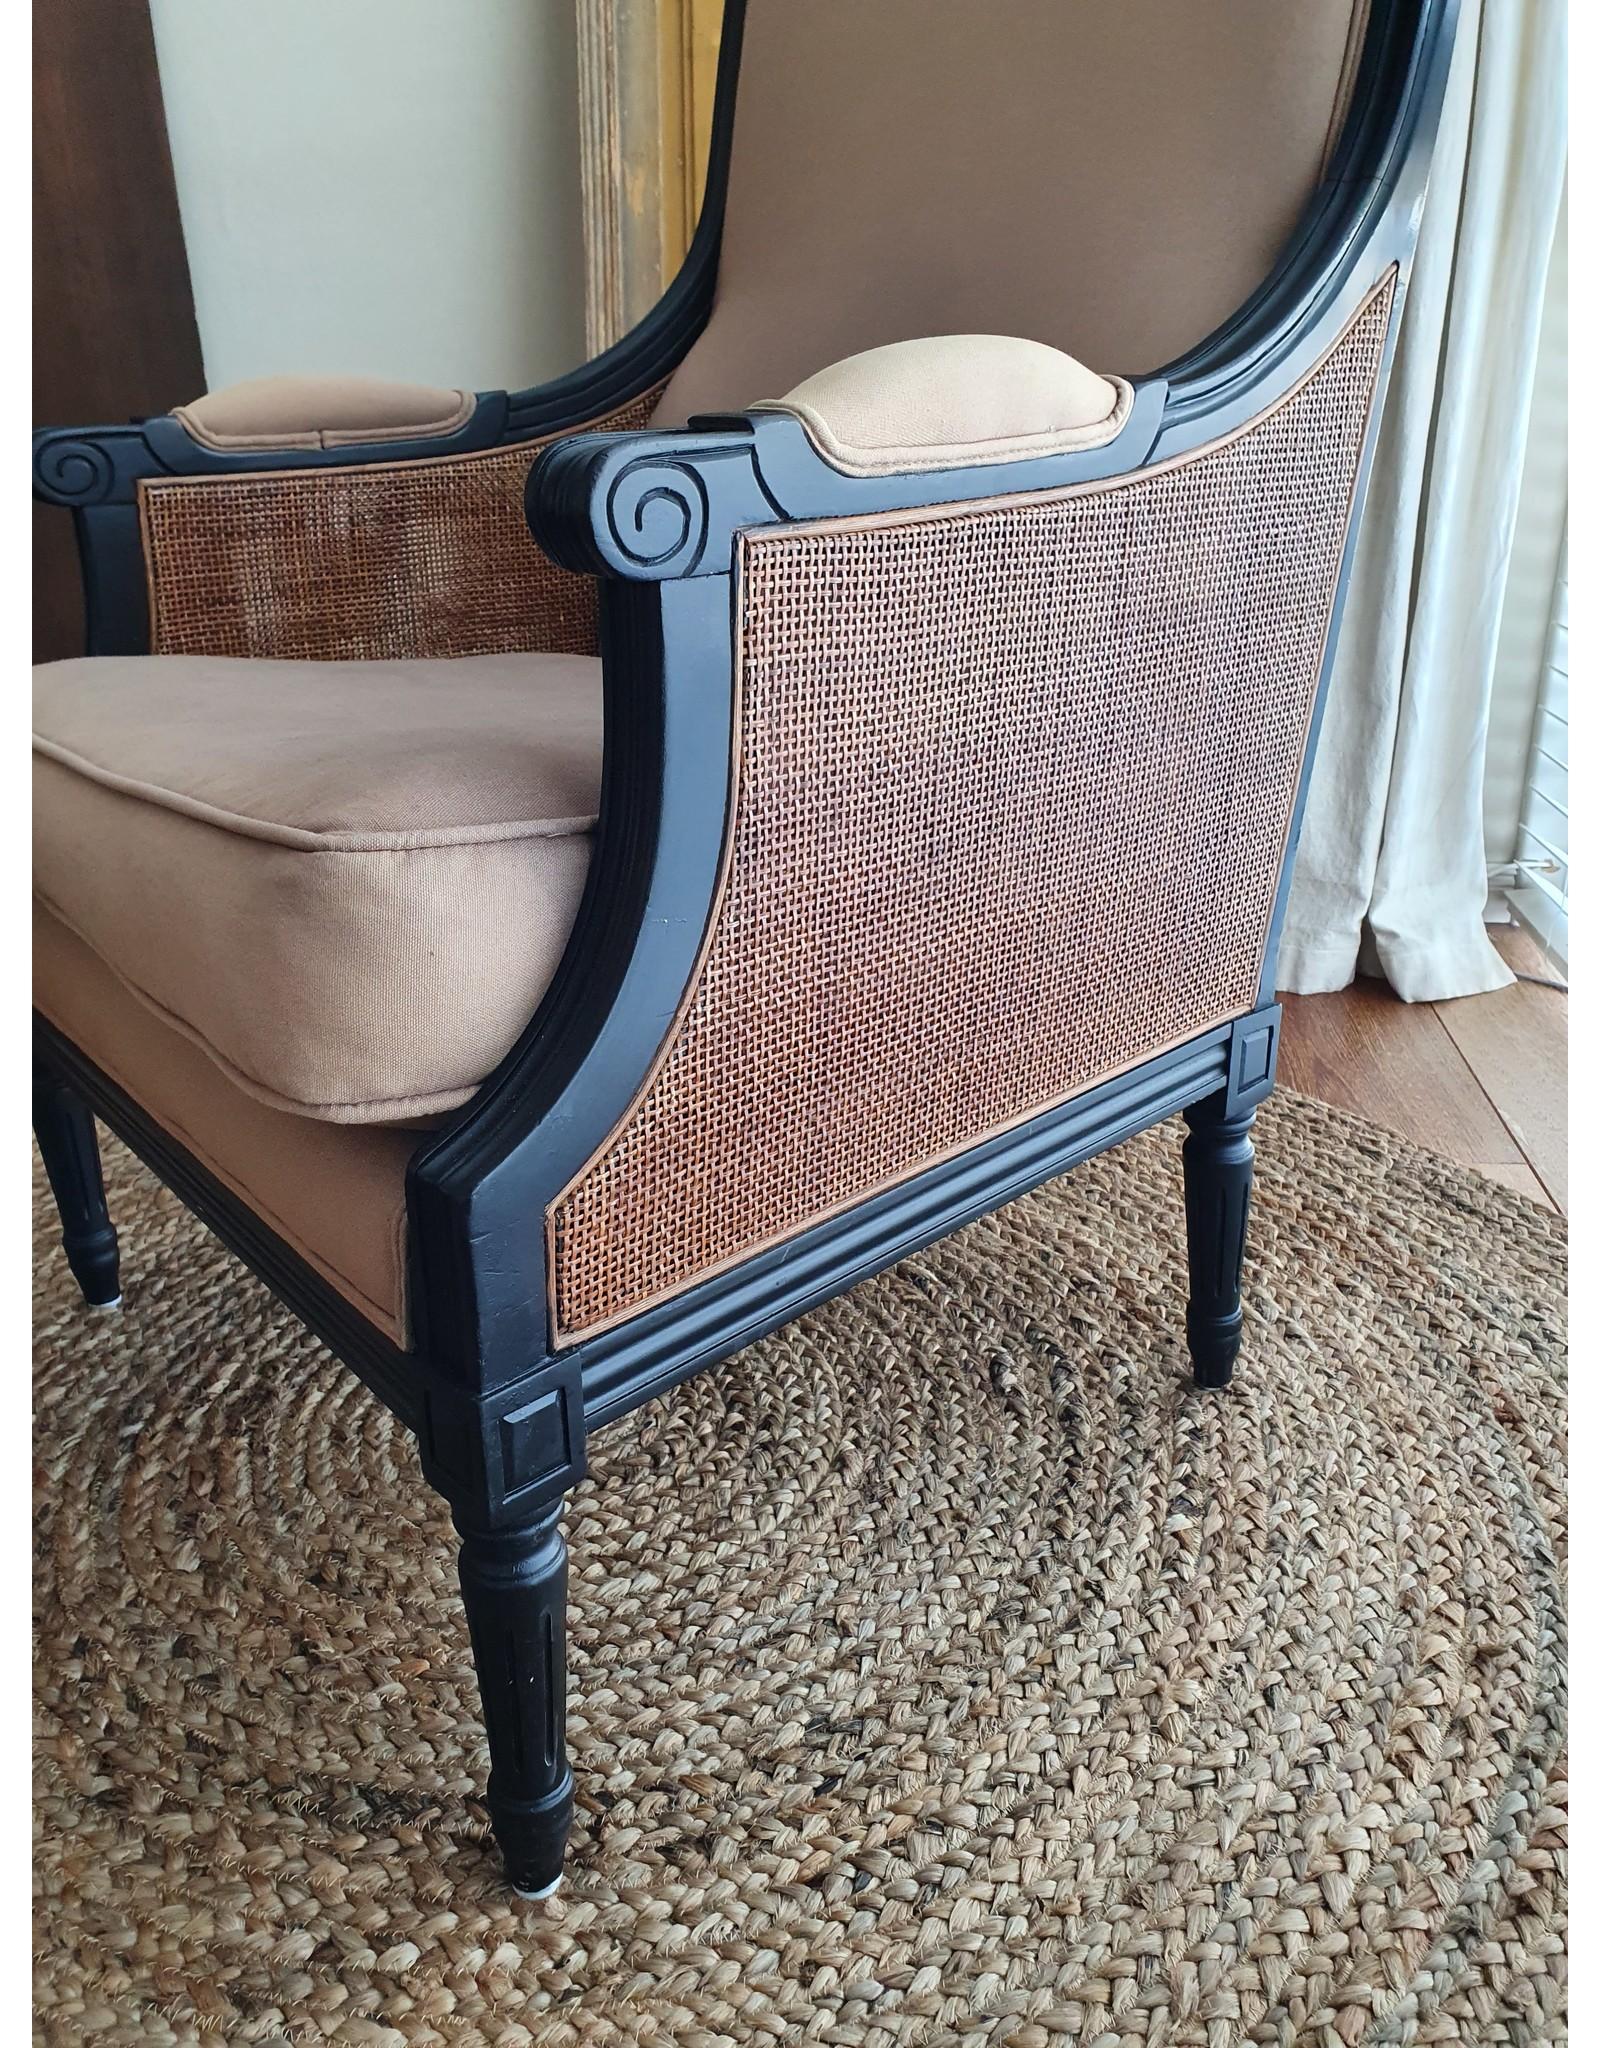 Brocante fauteuil landelijke stijl